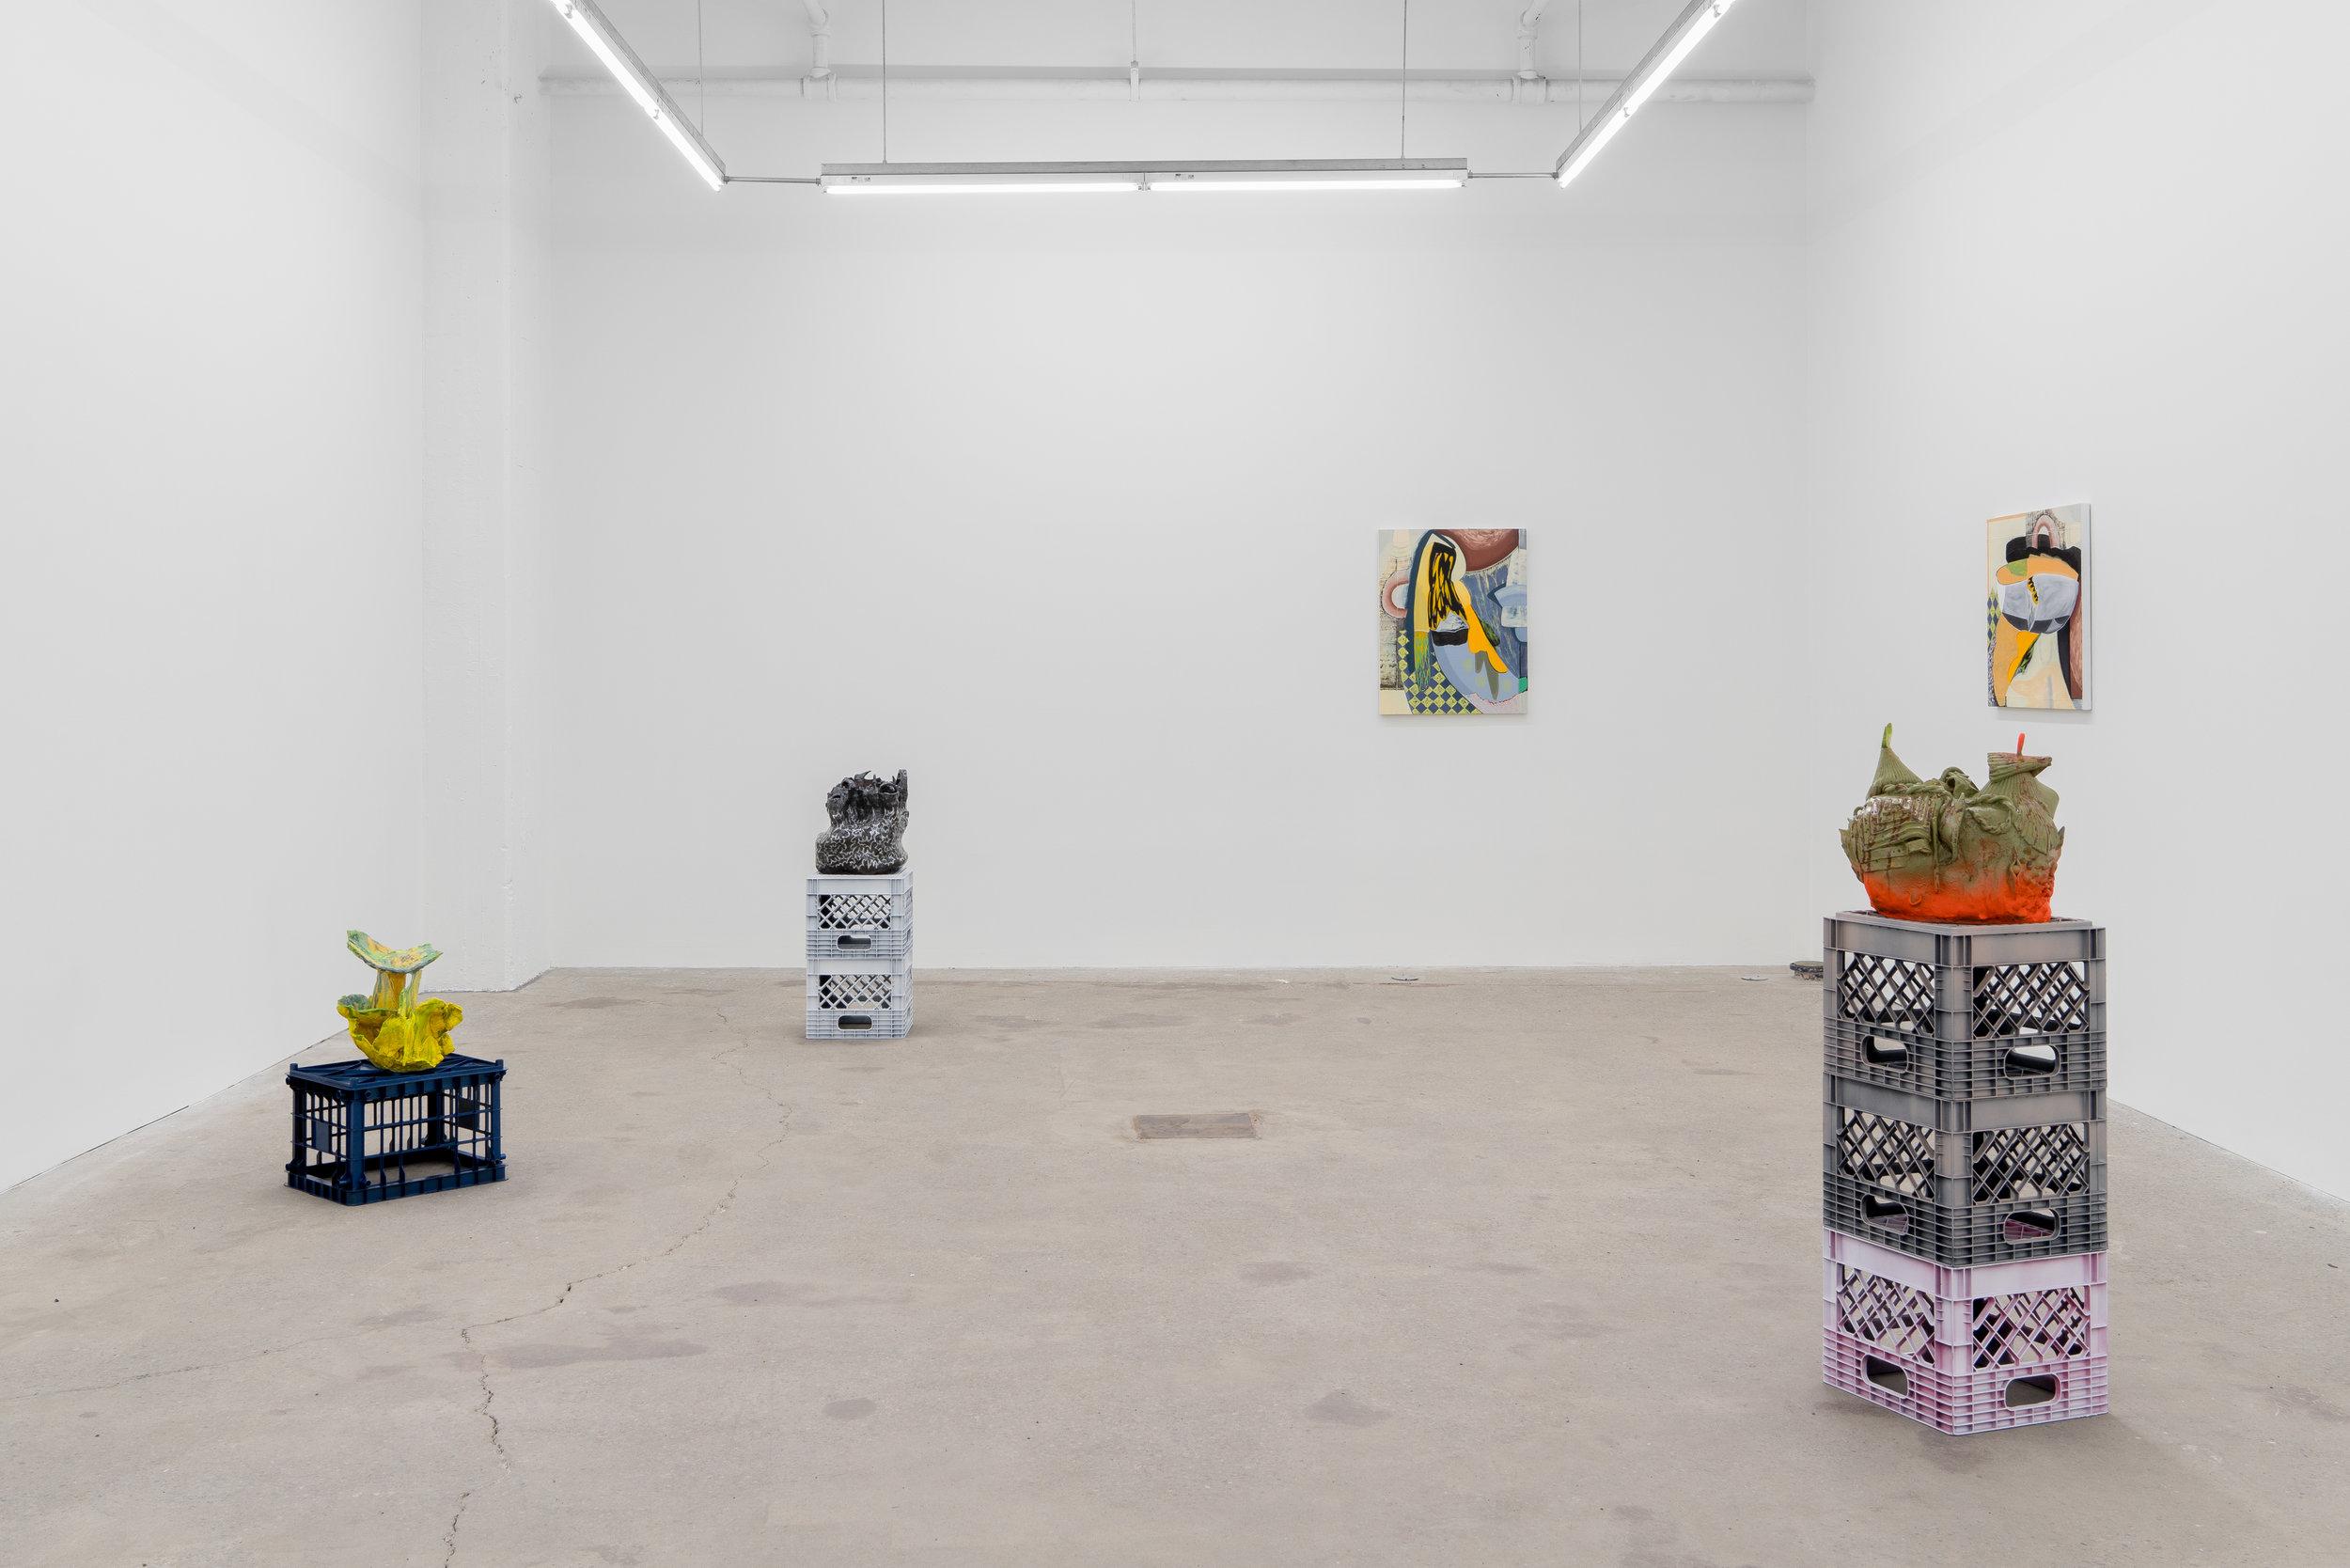 Magalie Guérin et Philippe Caron Lefebvre, 2019, vue d'exposition, Galerie Nicolas Robert, photo : Jean-Michael Seminaro